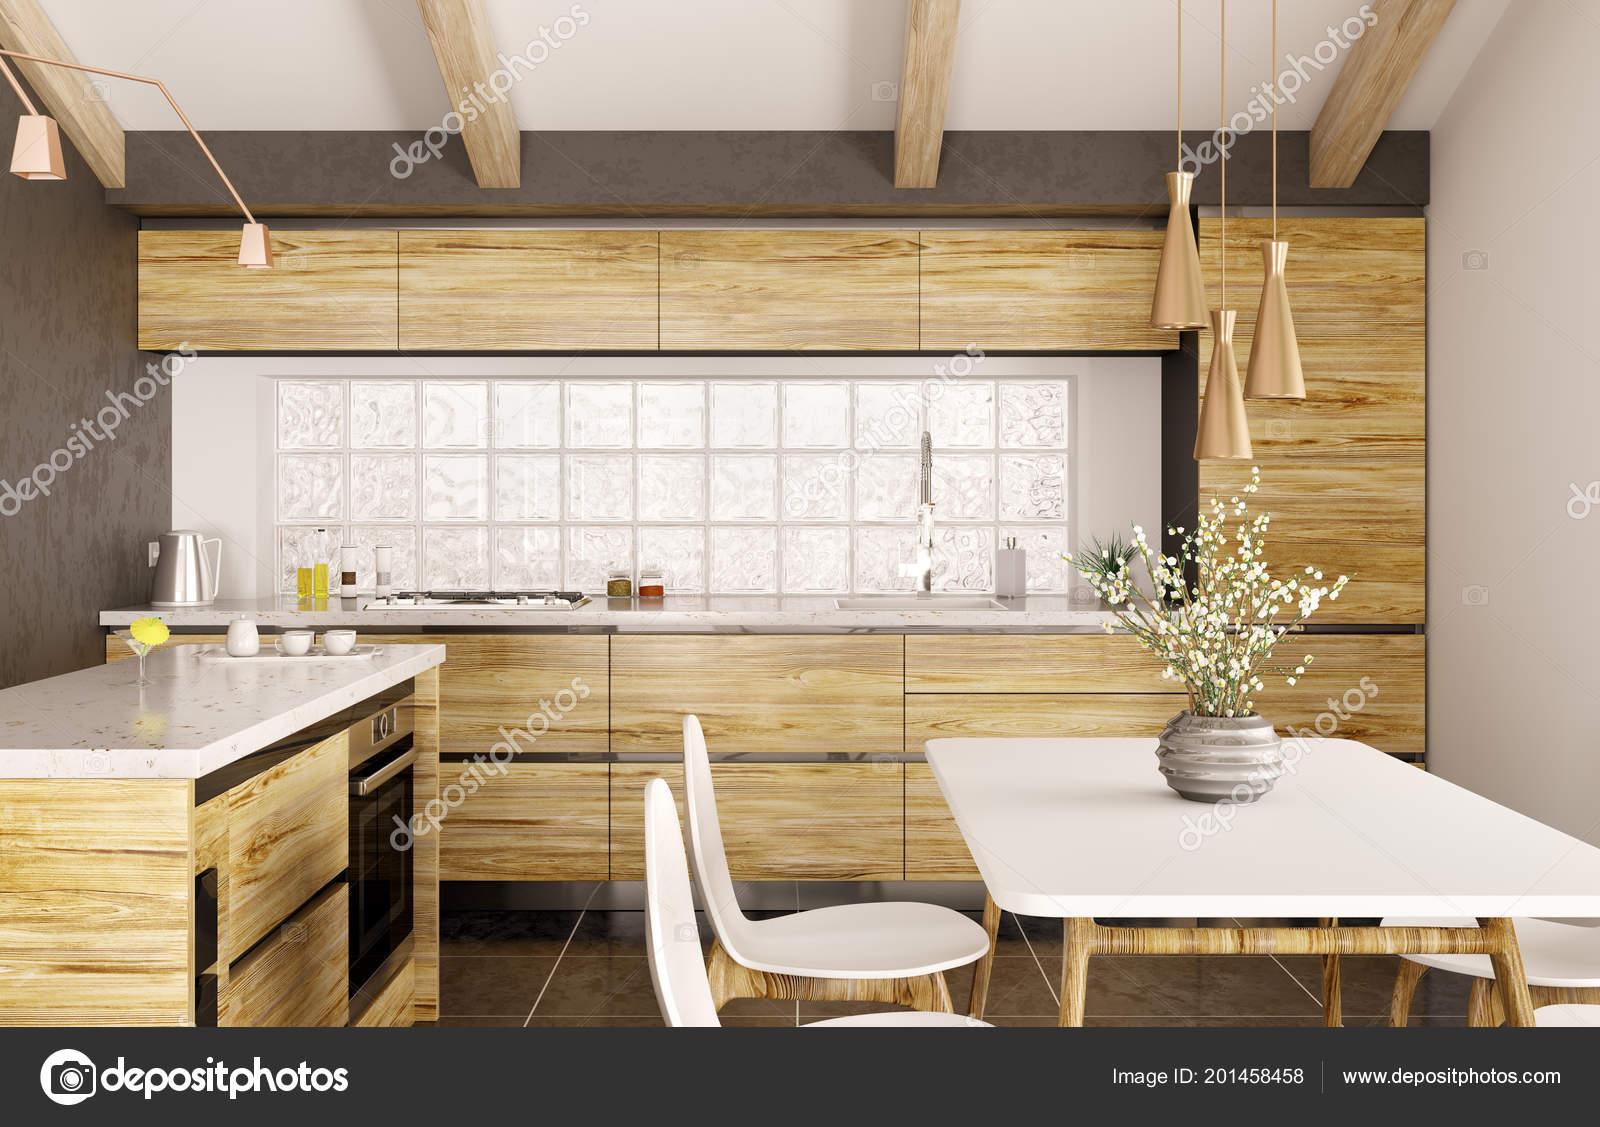 wooden kitchen table faucet manufacturers 现代室内设计的木制厨房与海岛白色大理石柜台桌子和椅子3d 图库照片